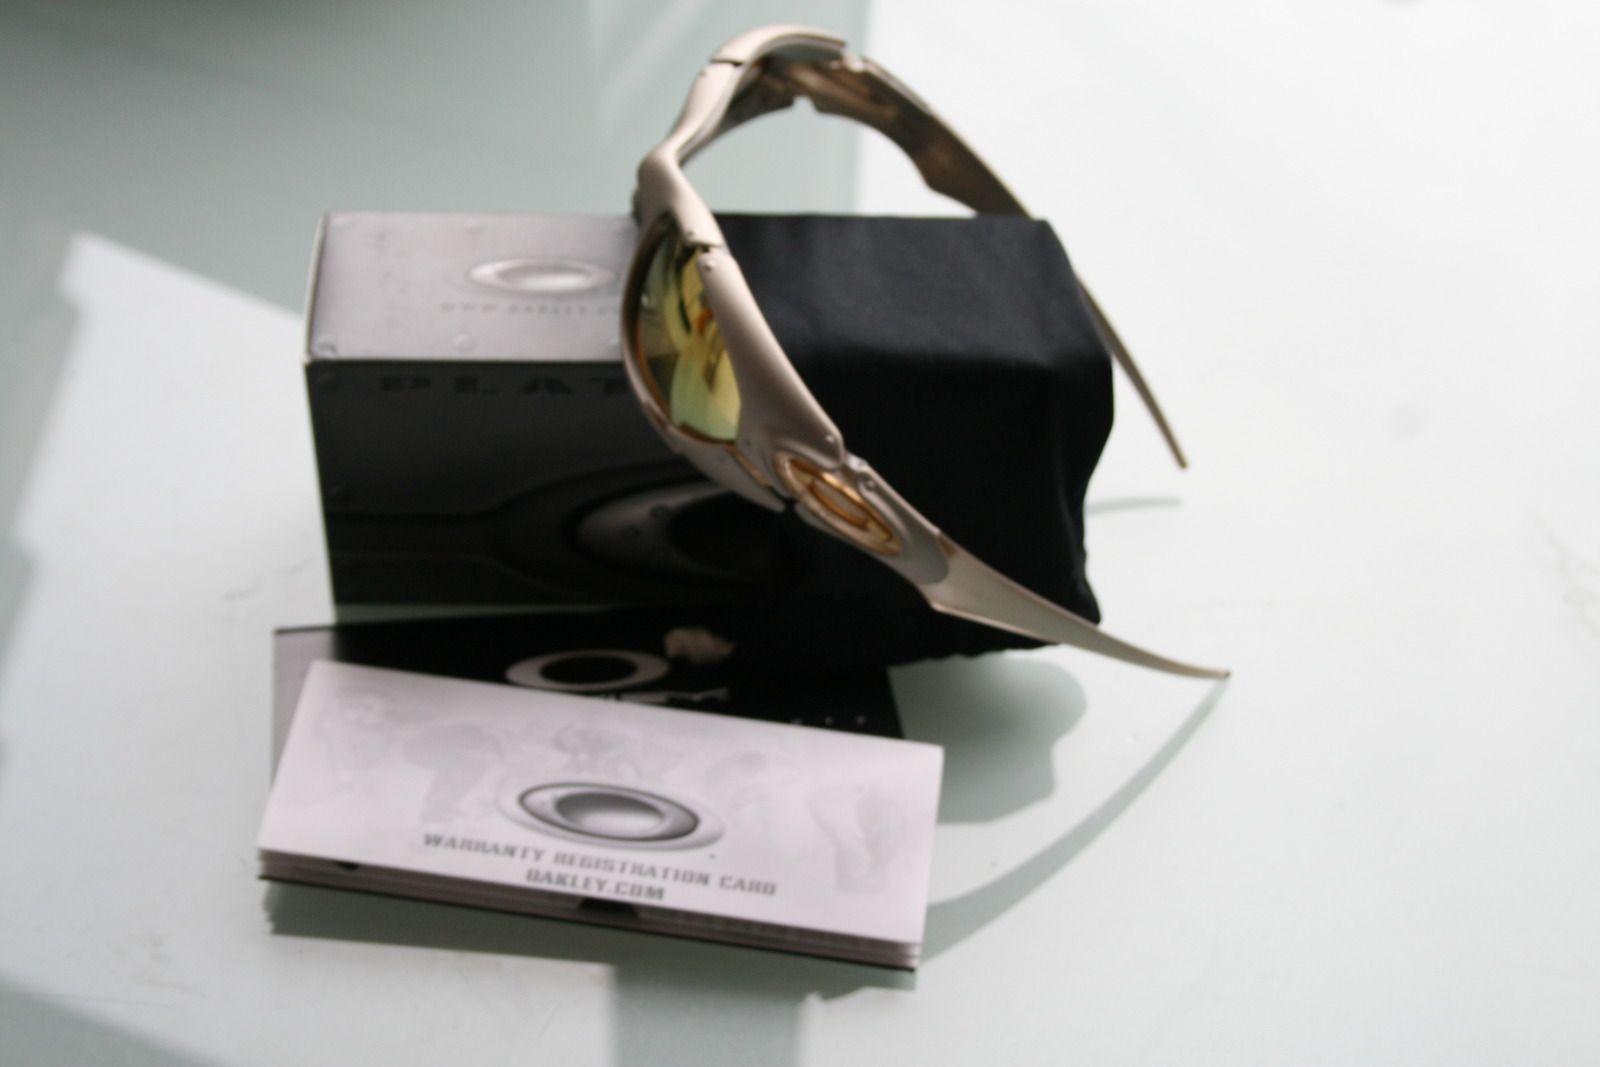 Oakley Plate Platinum X/24K Iridium Lens BNIB SKU# 03-851 - plateglod.jpg